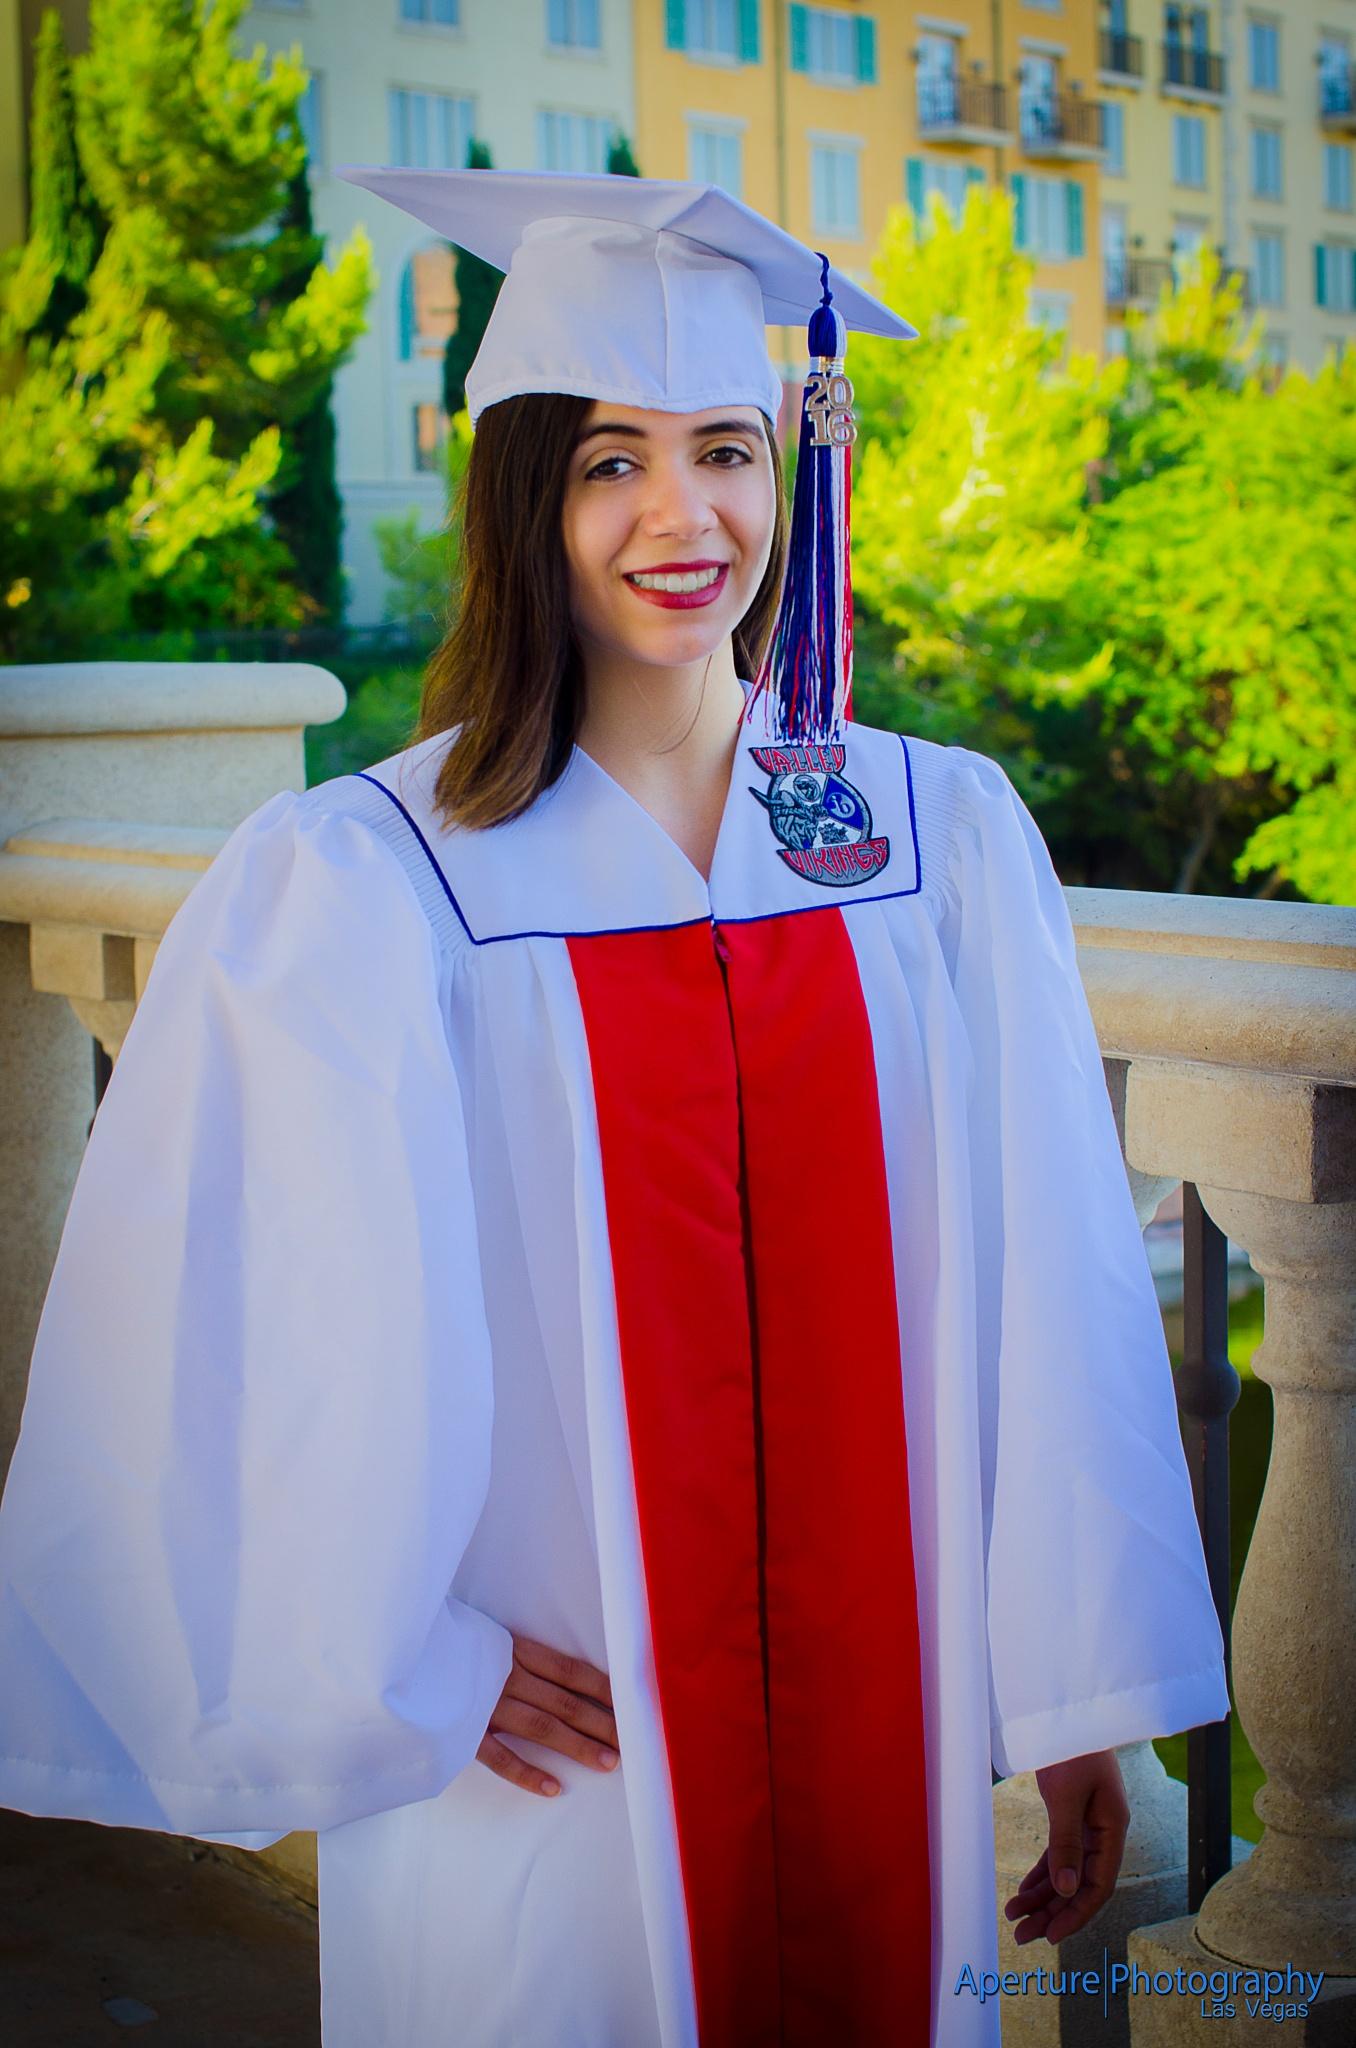 graduation 2016 by Aperture Photography-LasVegas